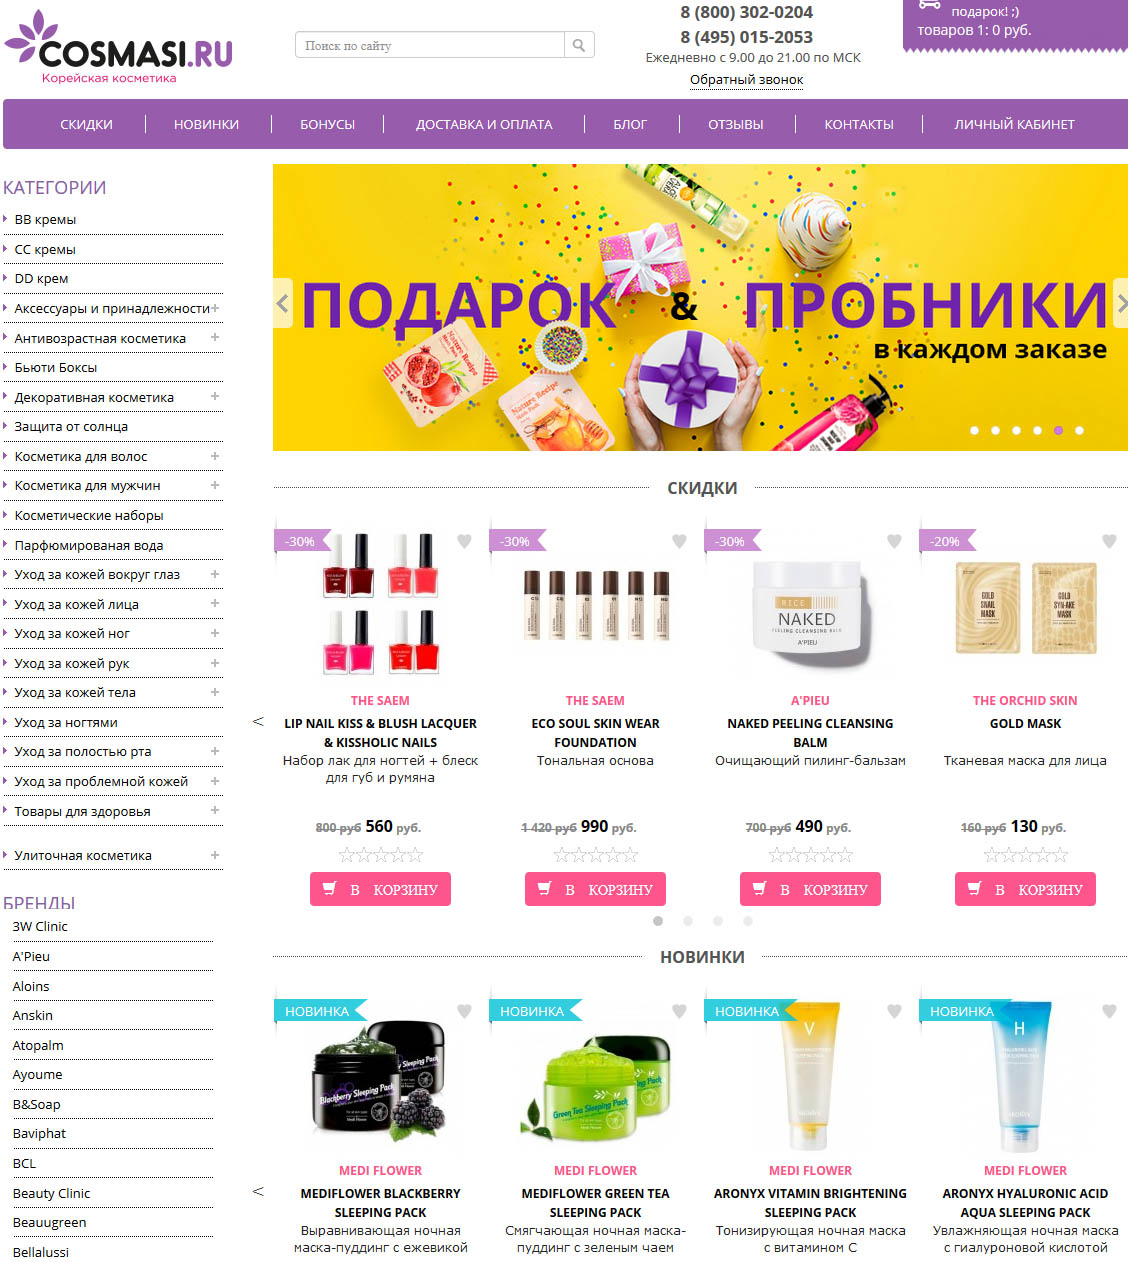 Интернет-магазин Космаси